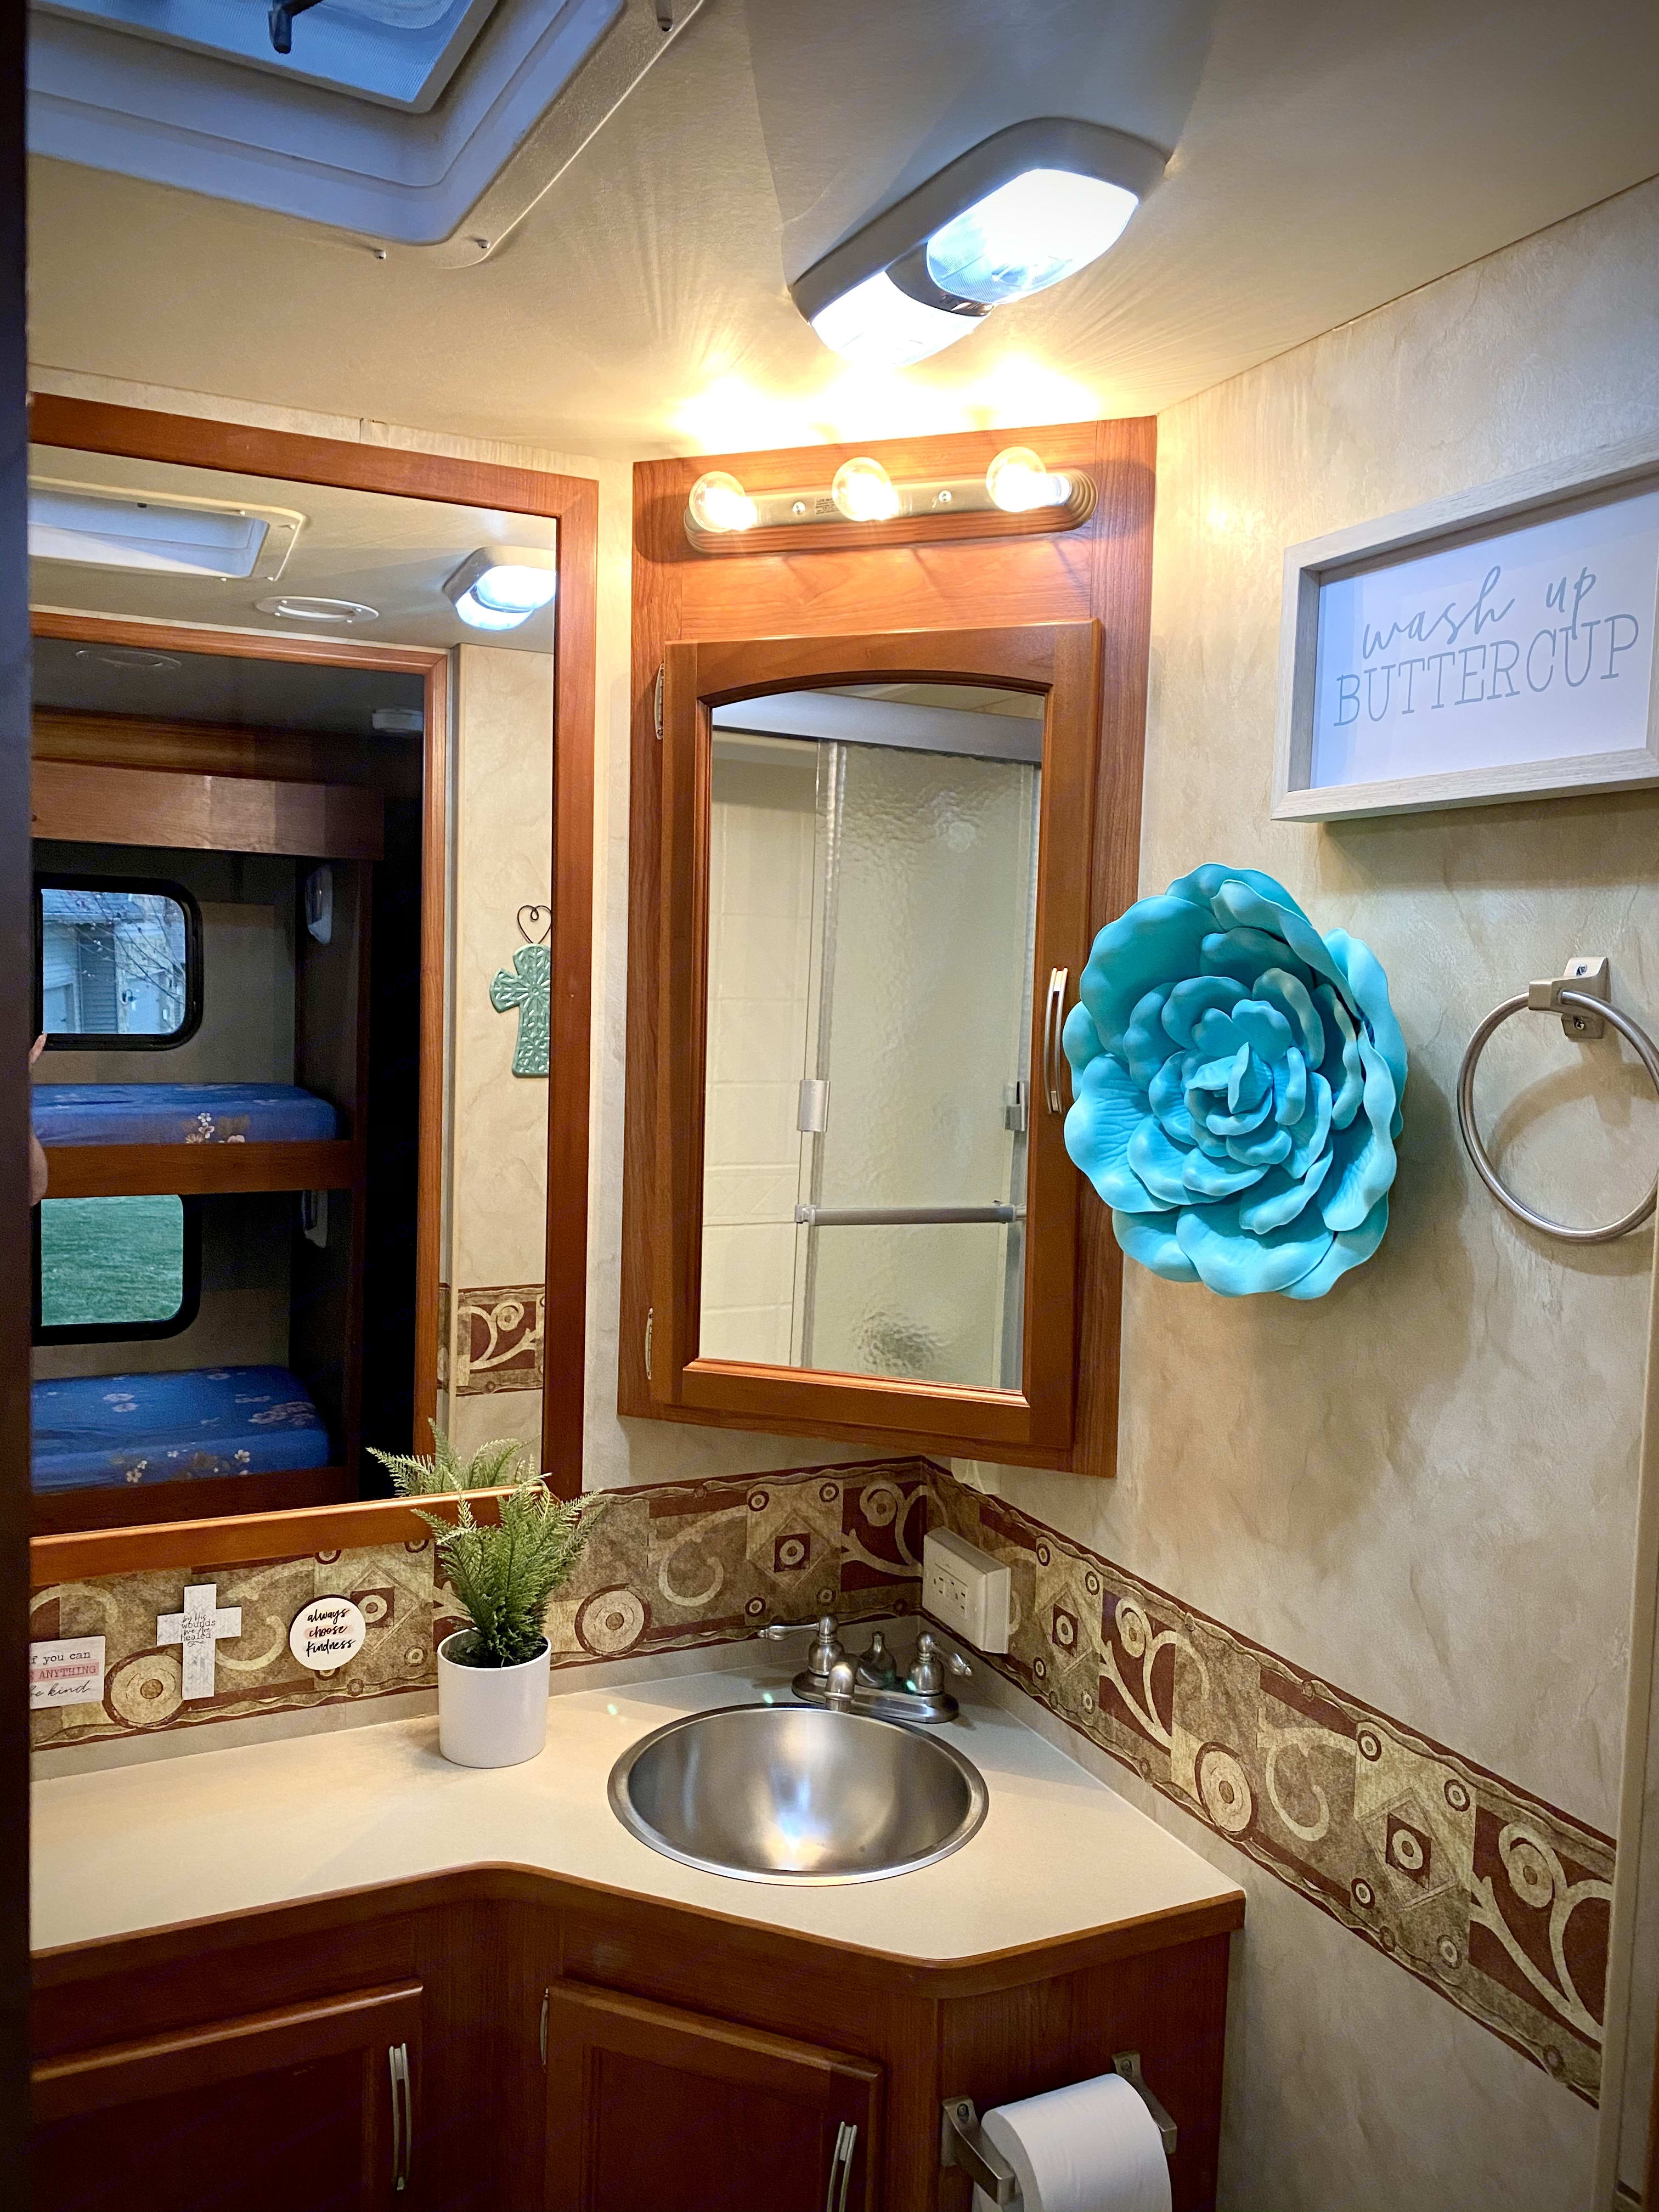 Spacious Bathroom. Holiday Rambler Arista 2010